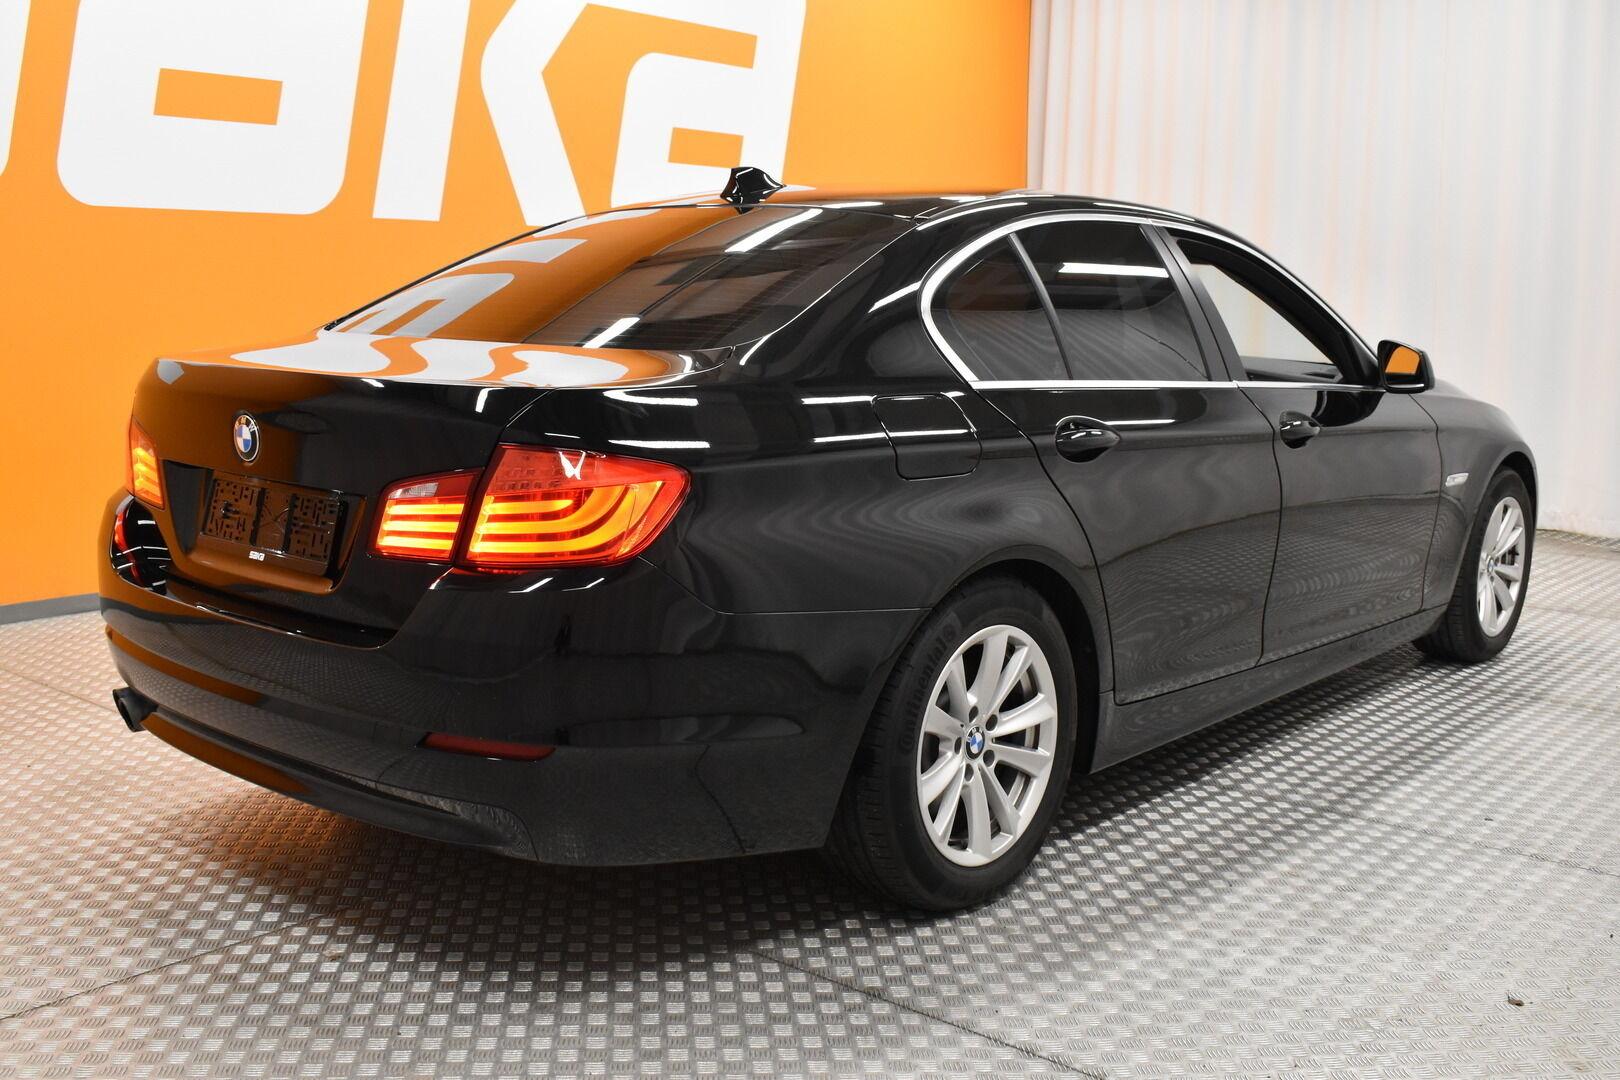 Musta Sedan, BMW 528 – POR-8128, kuva 4